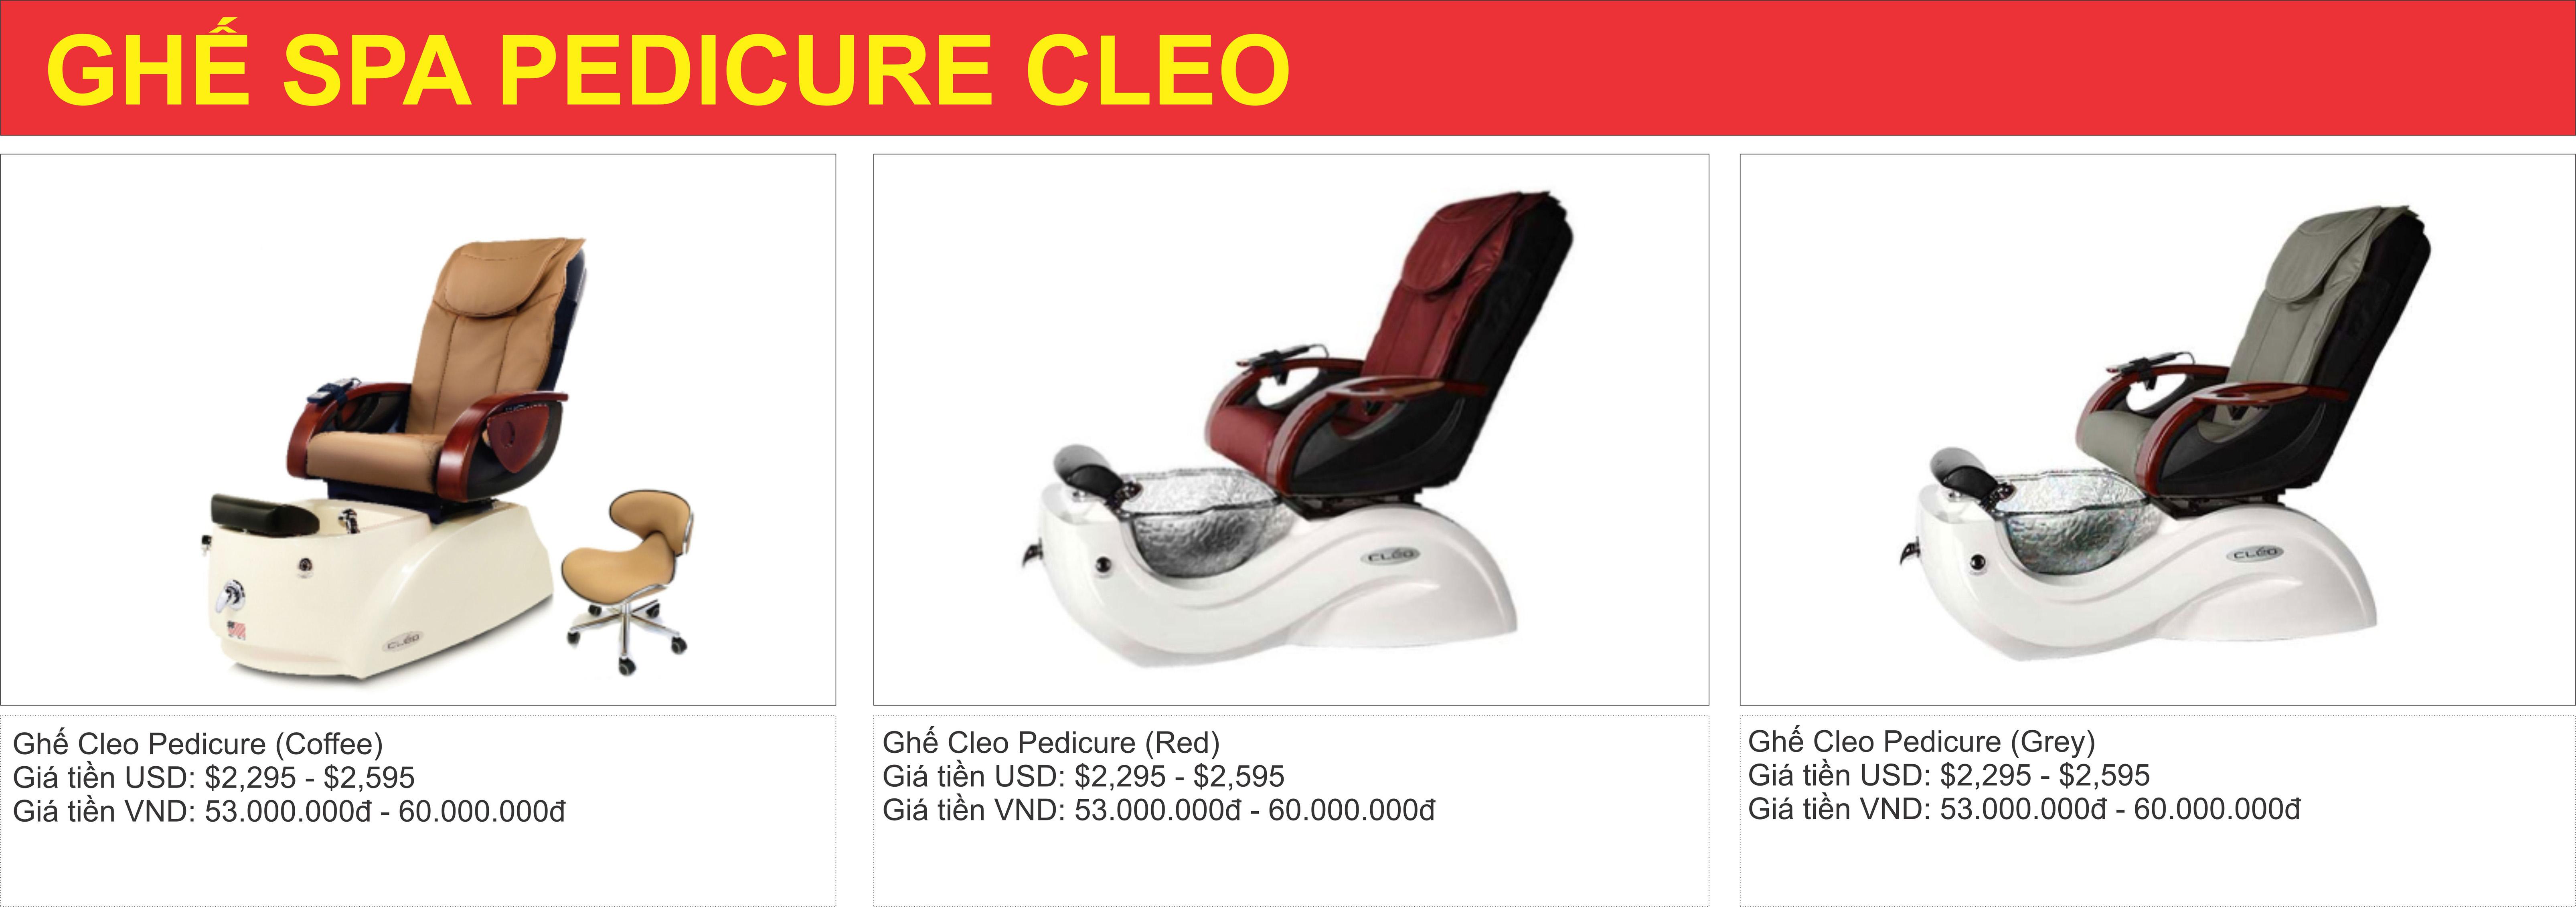 ghe-nail-spa-pedicure-cleo